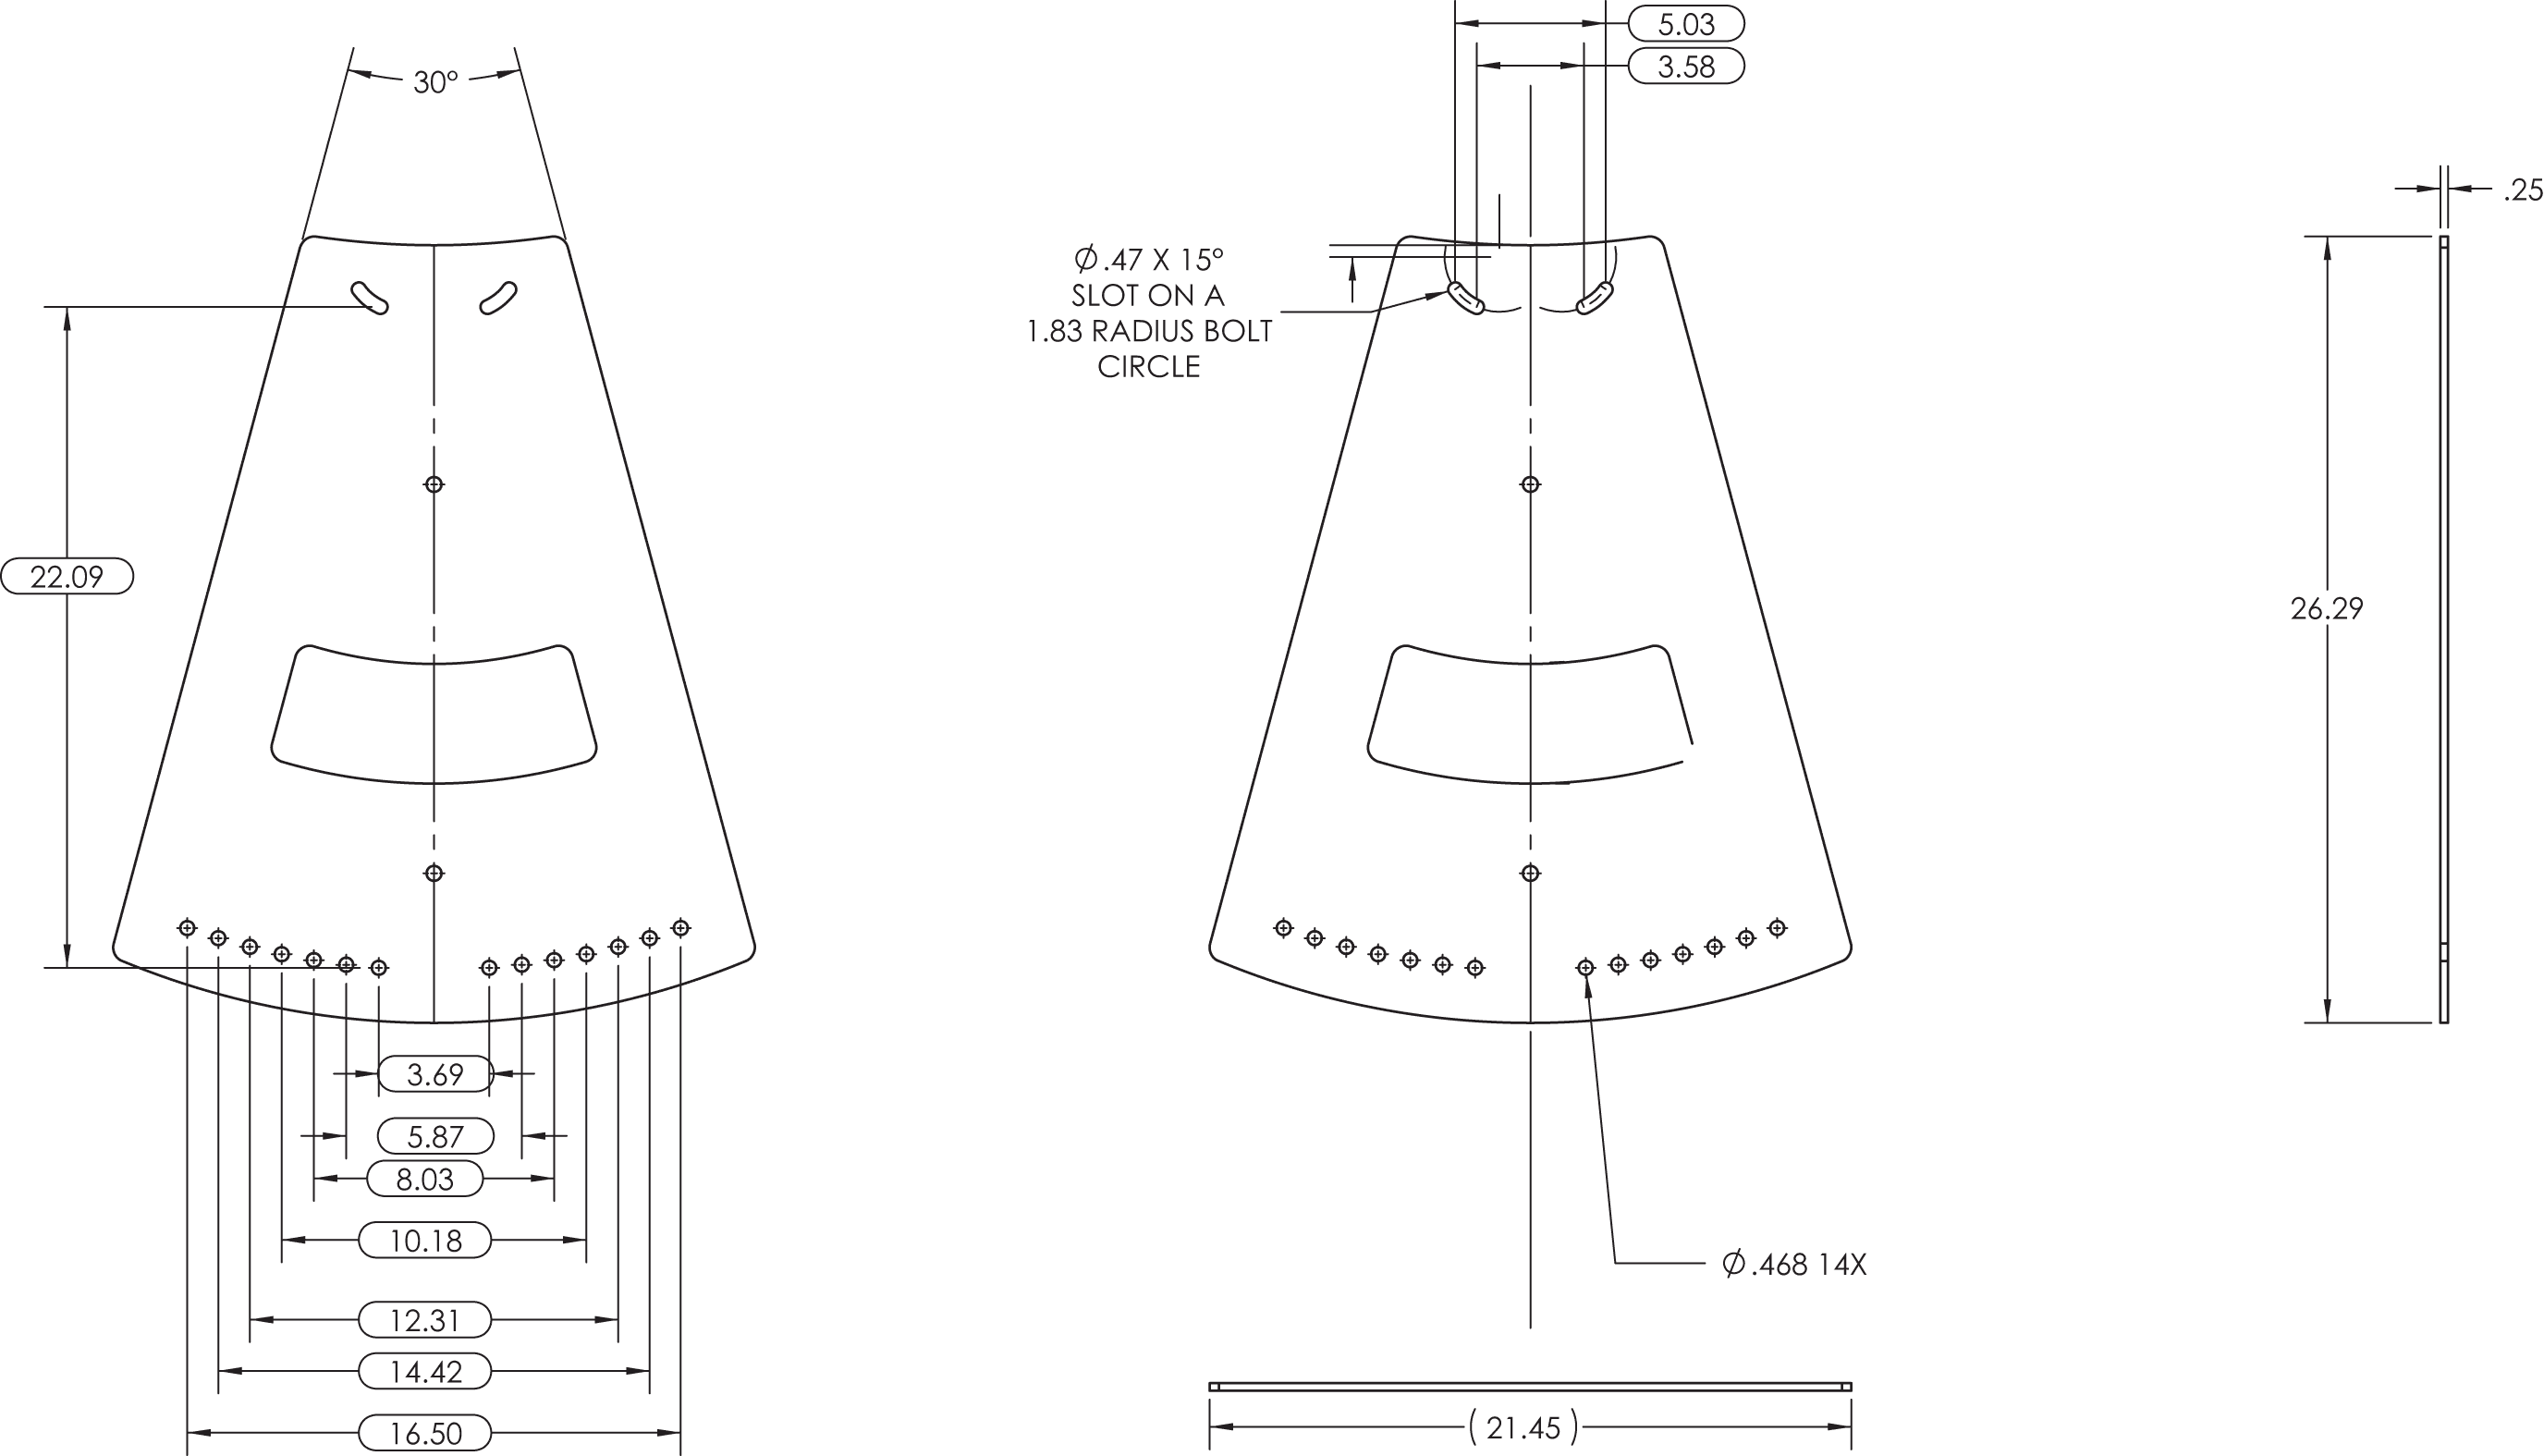 FP-PD5200-3X1SS-Drawings